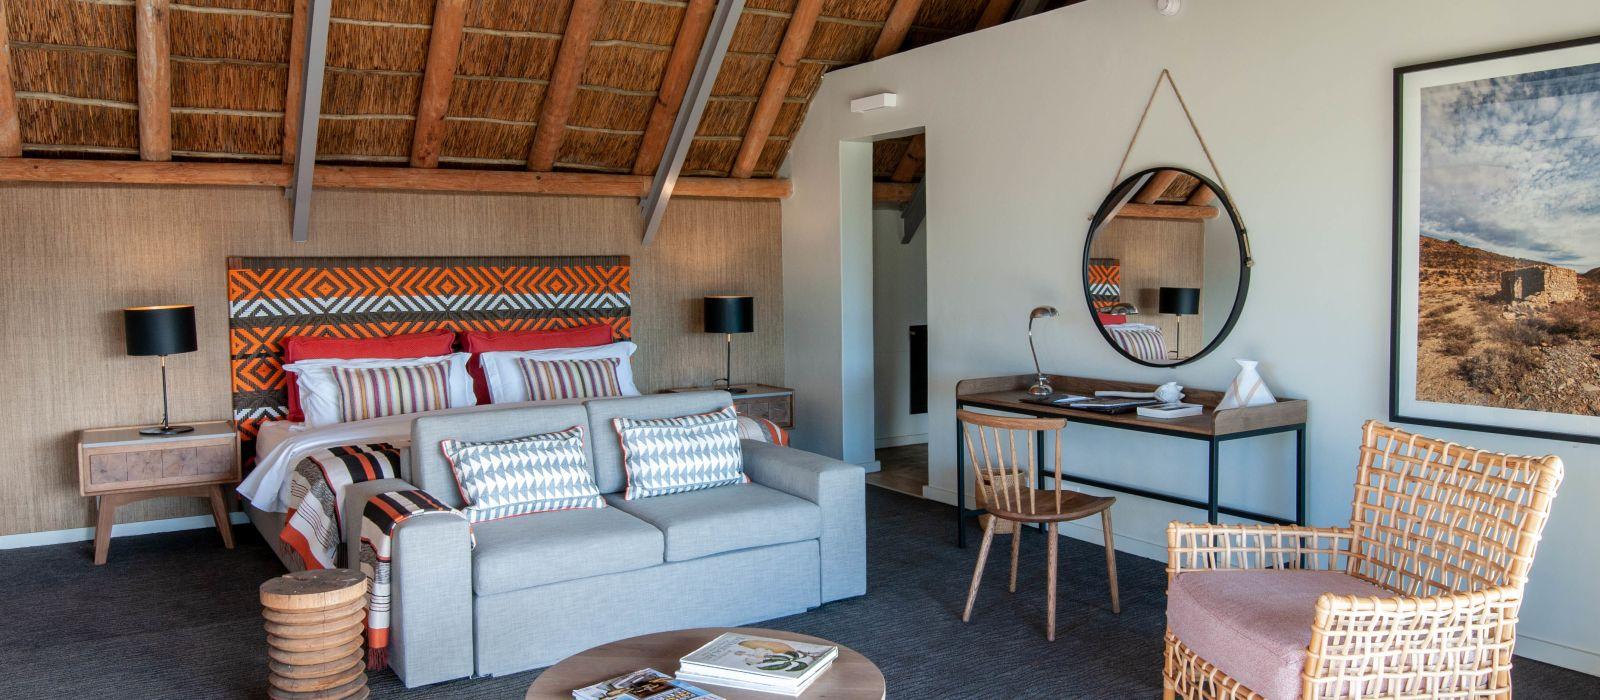 Hotel Sanbona Gondwana Lodge South Africa